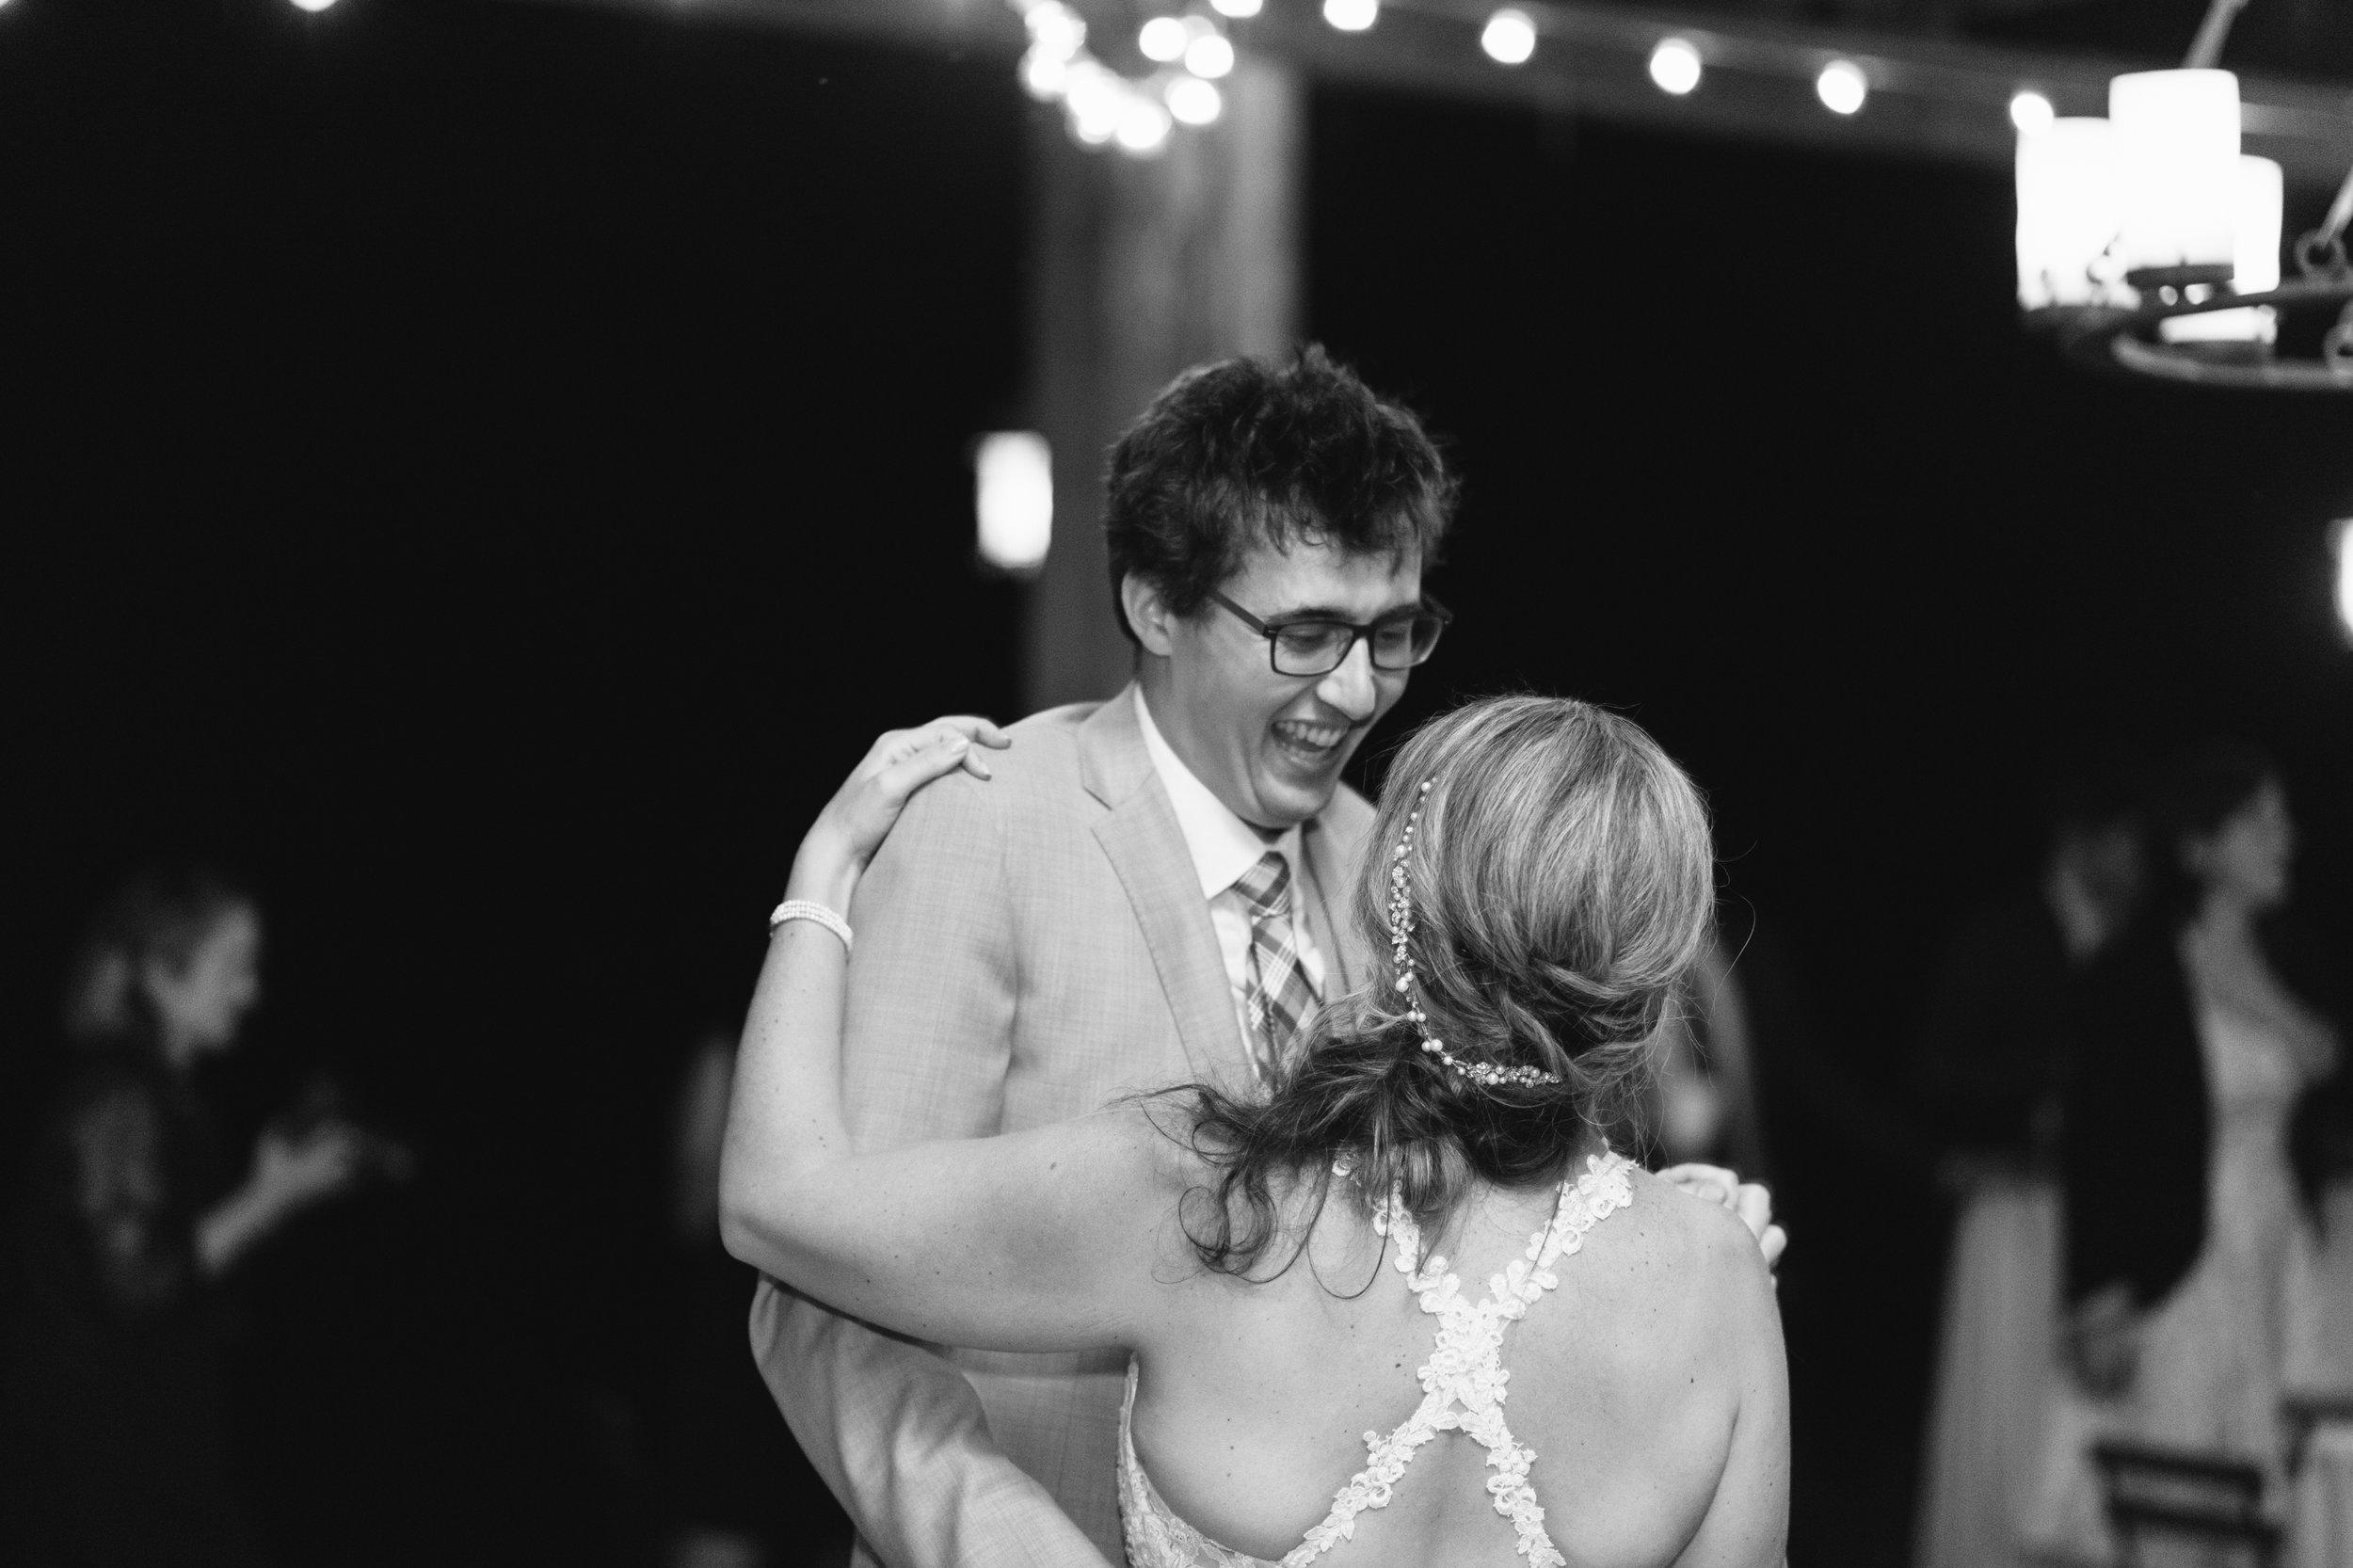 Abby_Simon_Wedding_Abigail_Malone_Photography_nashville_Bloomsbury_Farm-603.jpg